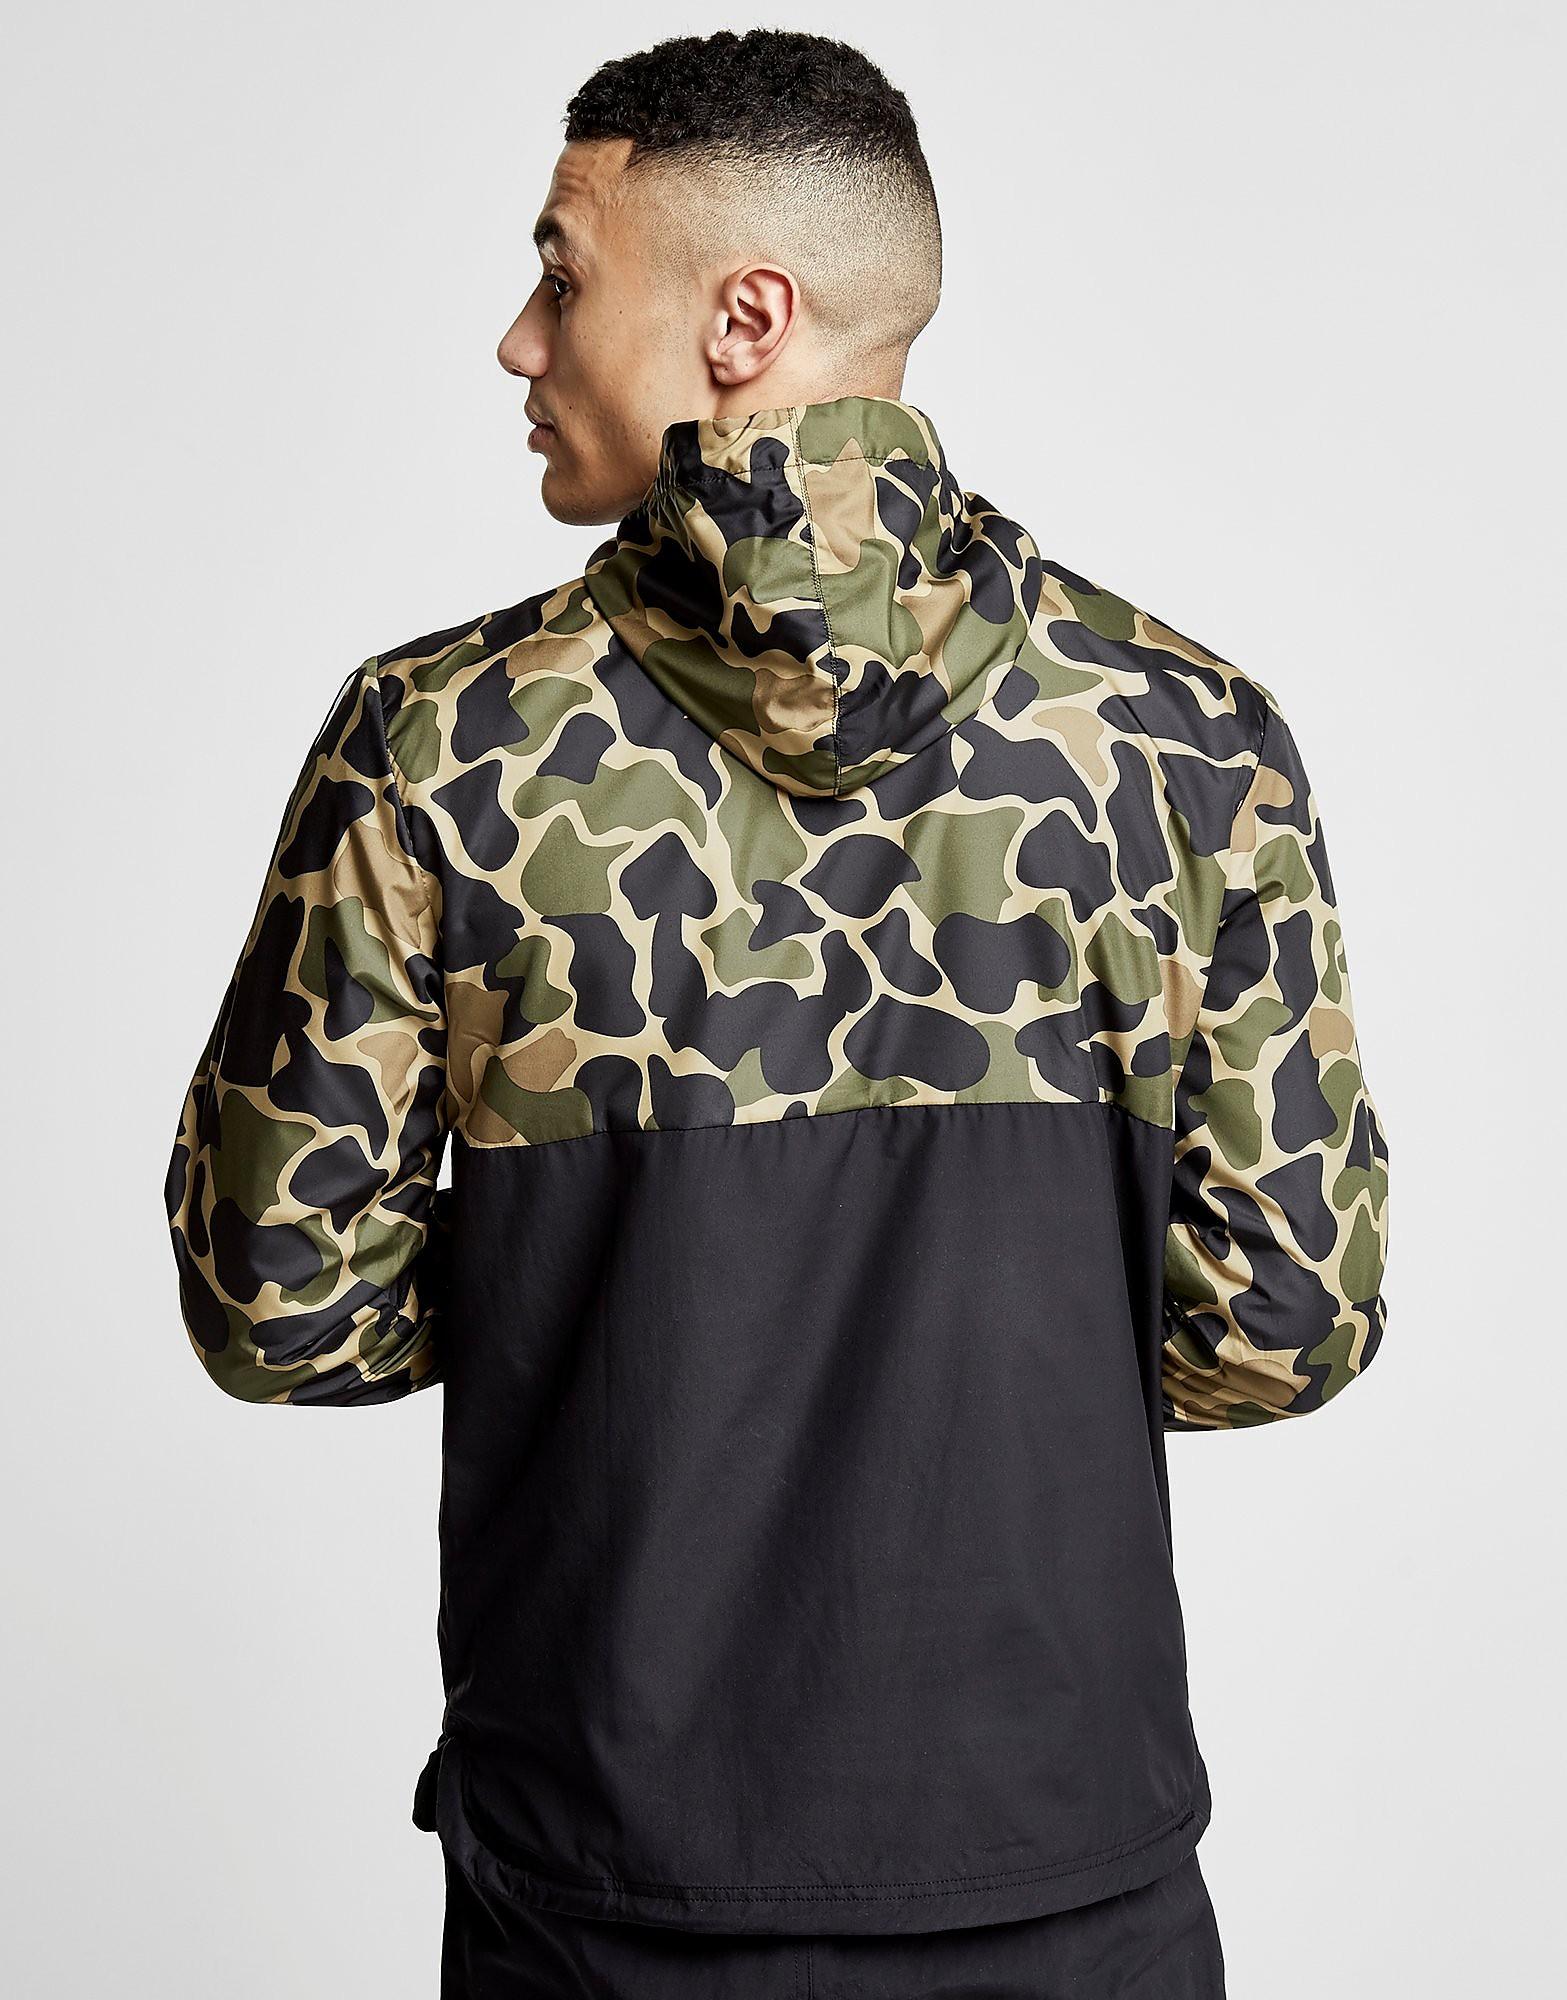 adidas Originals Trefoil 1/2 Zip Jacket